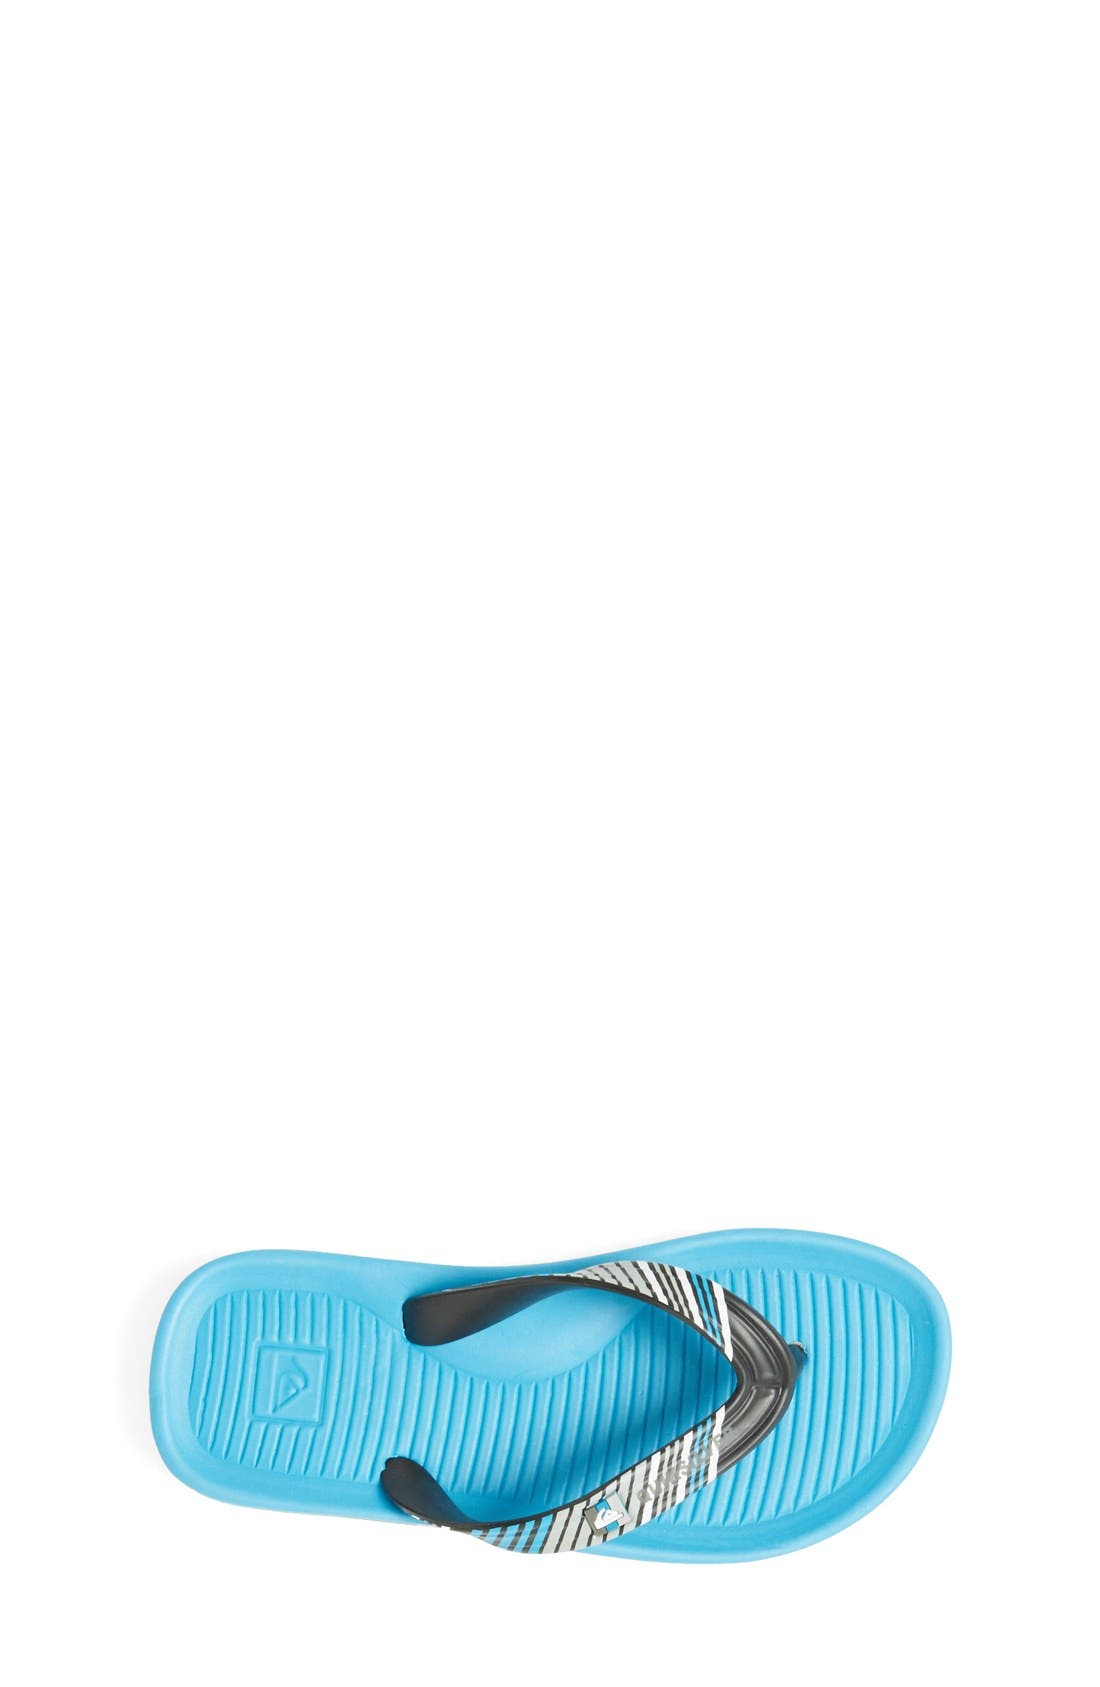 Alternate Image 3  - Quiksilver 'Haleiwa' Flip Flop (Toddler, Little Kid & Big Kid)